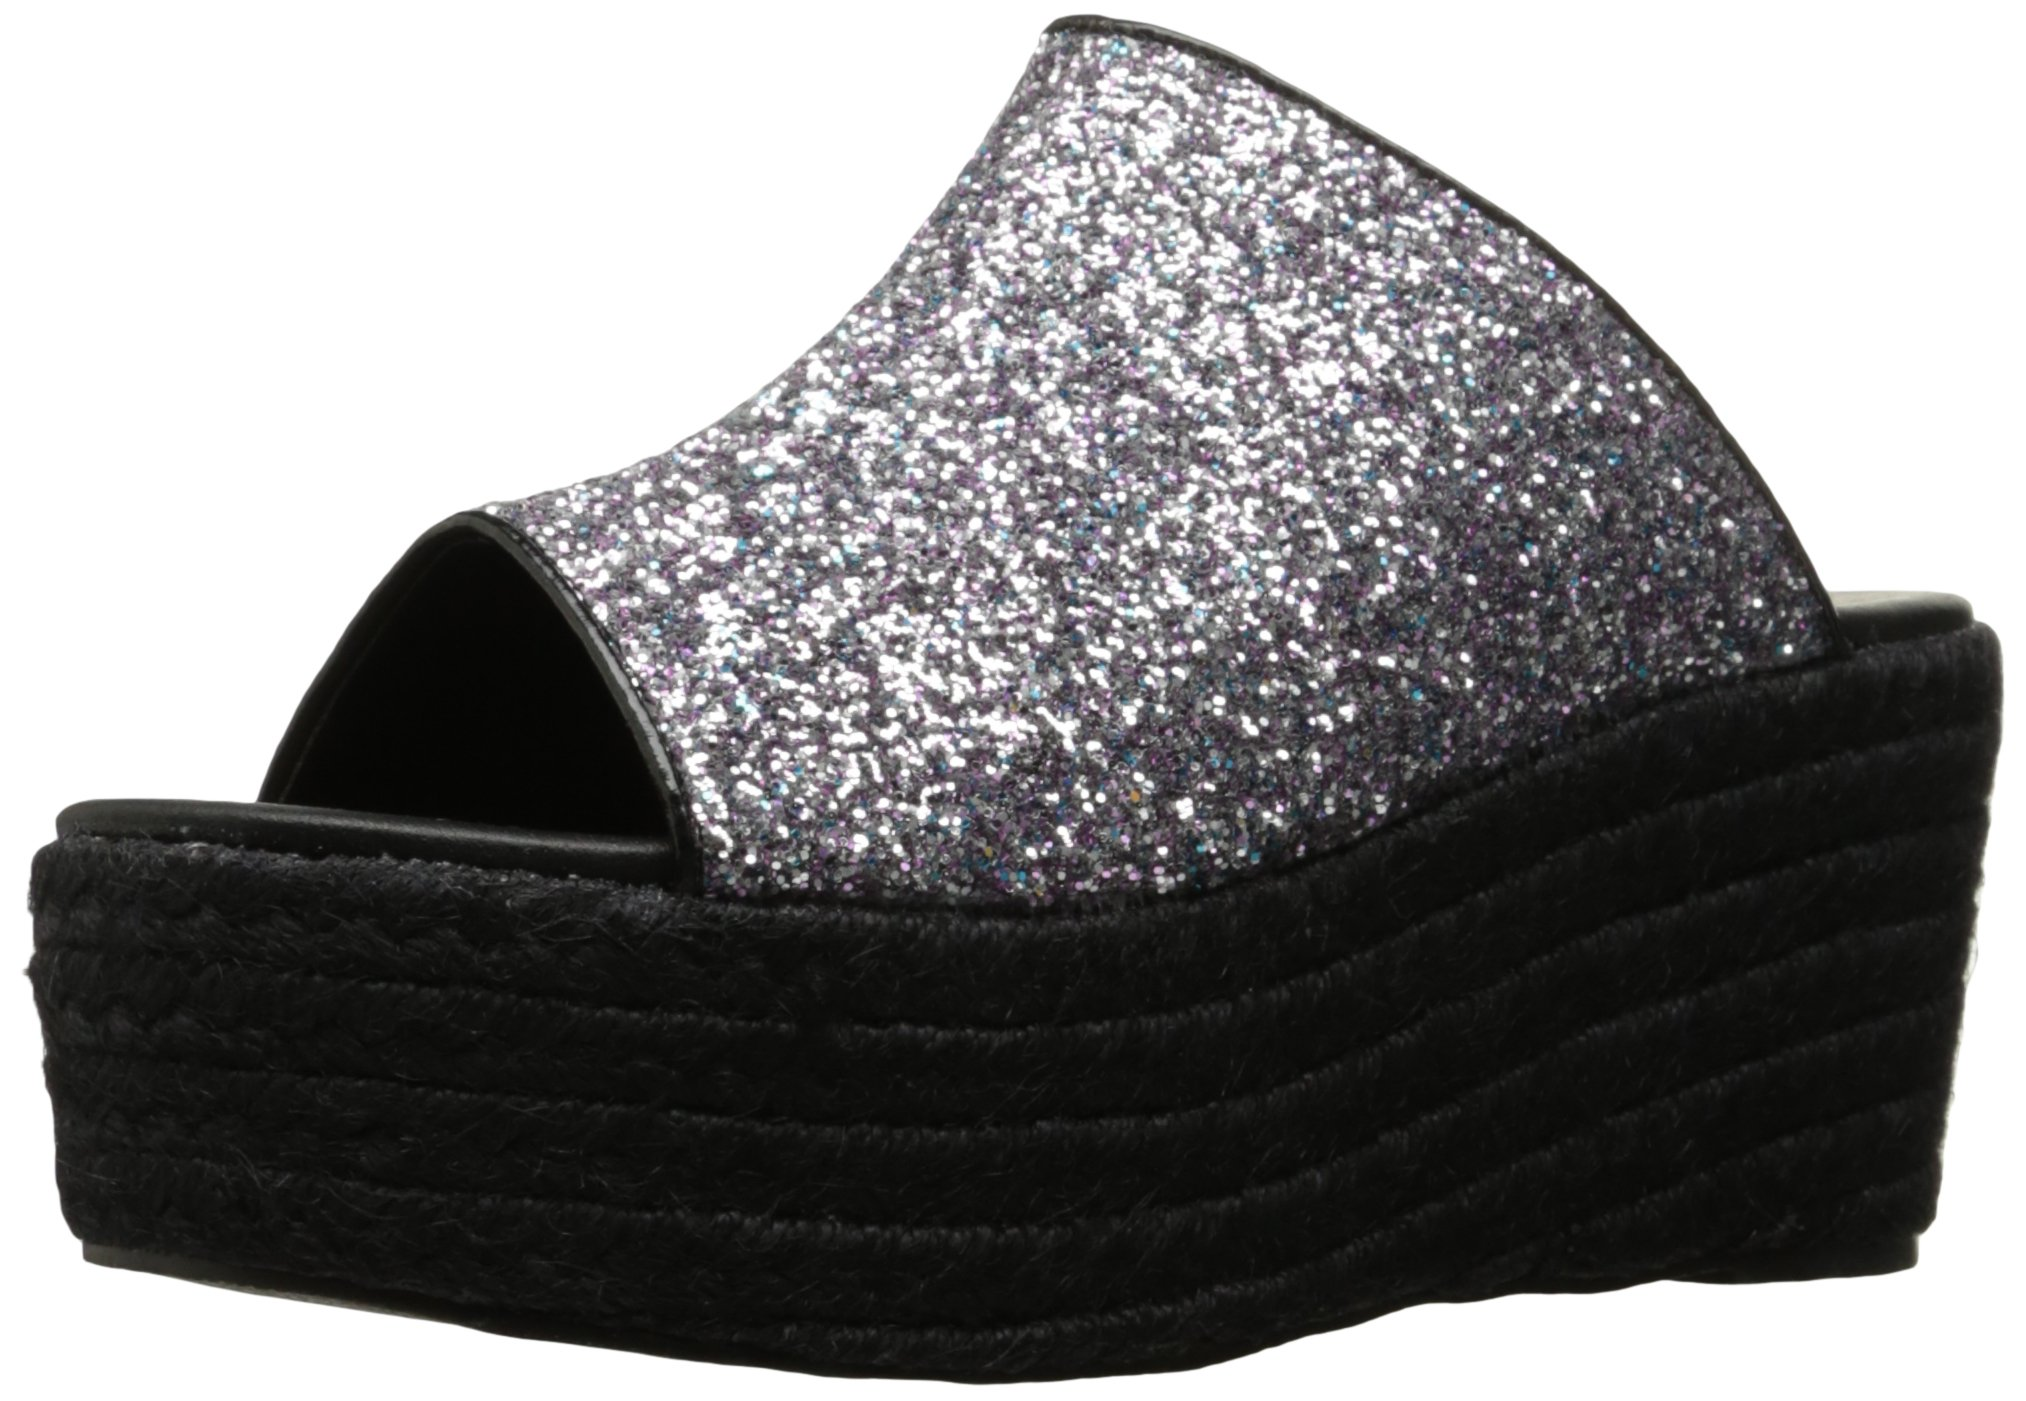 Penny Loves Kenny Women's Fickle Platform Sandal, Black/Multi, 8.5 W US